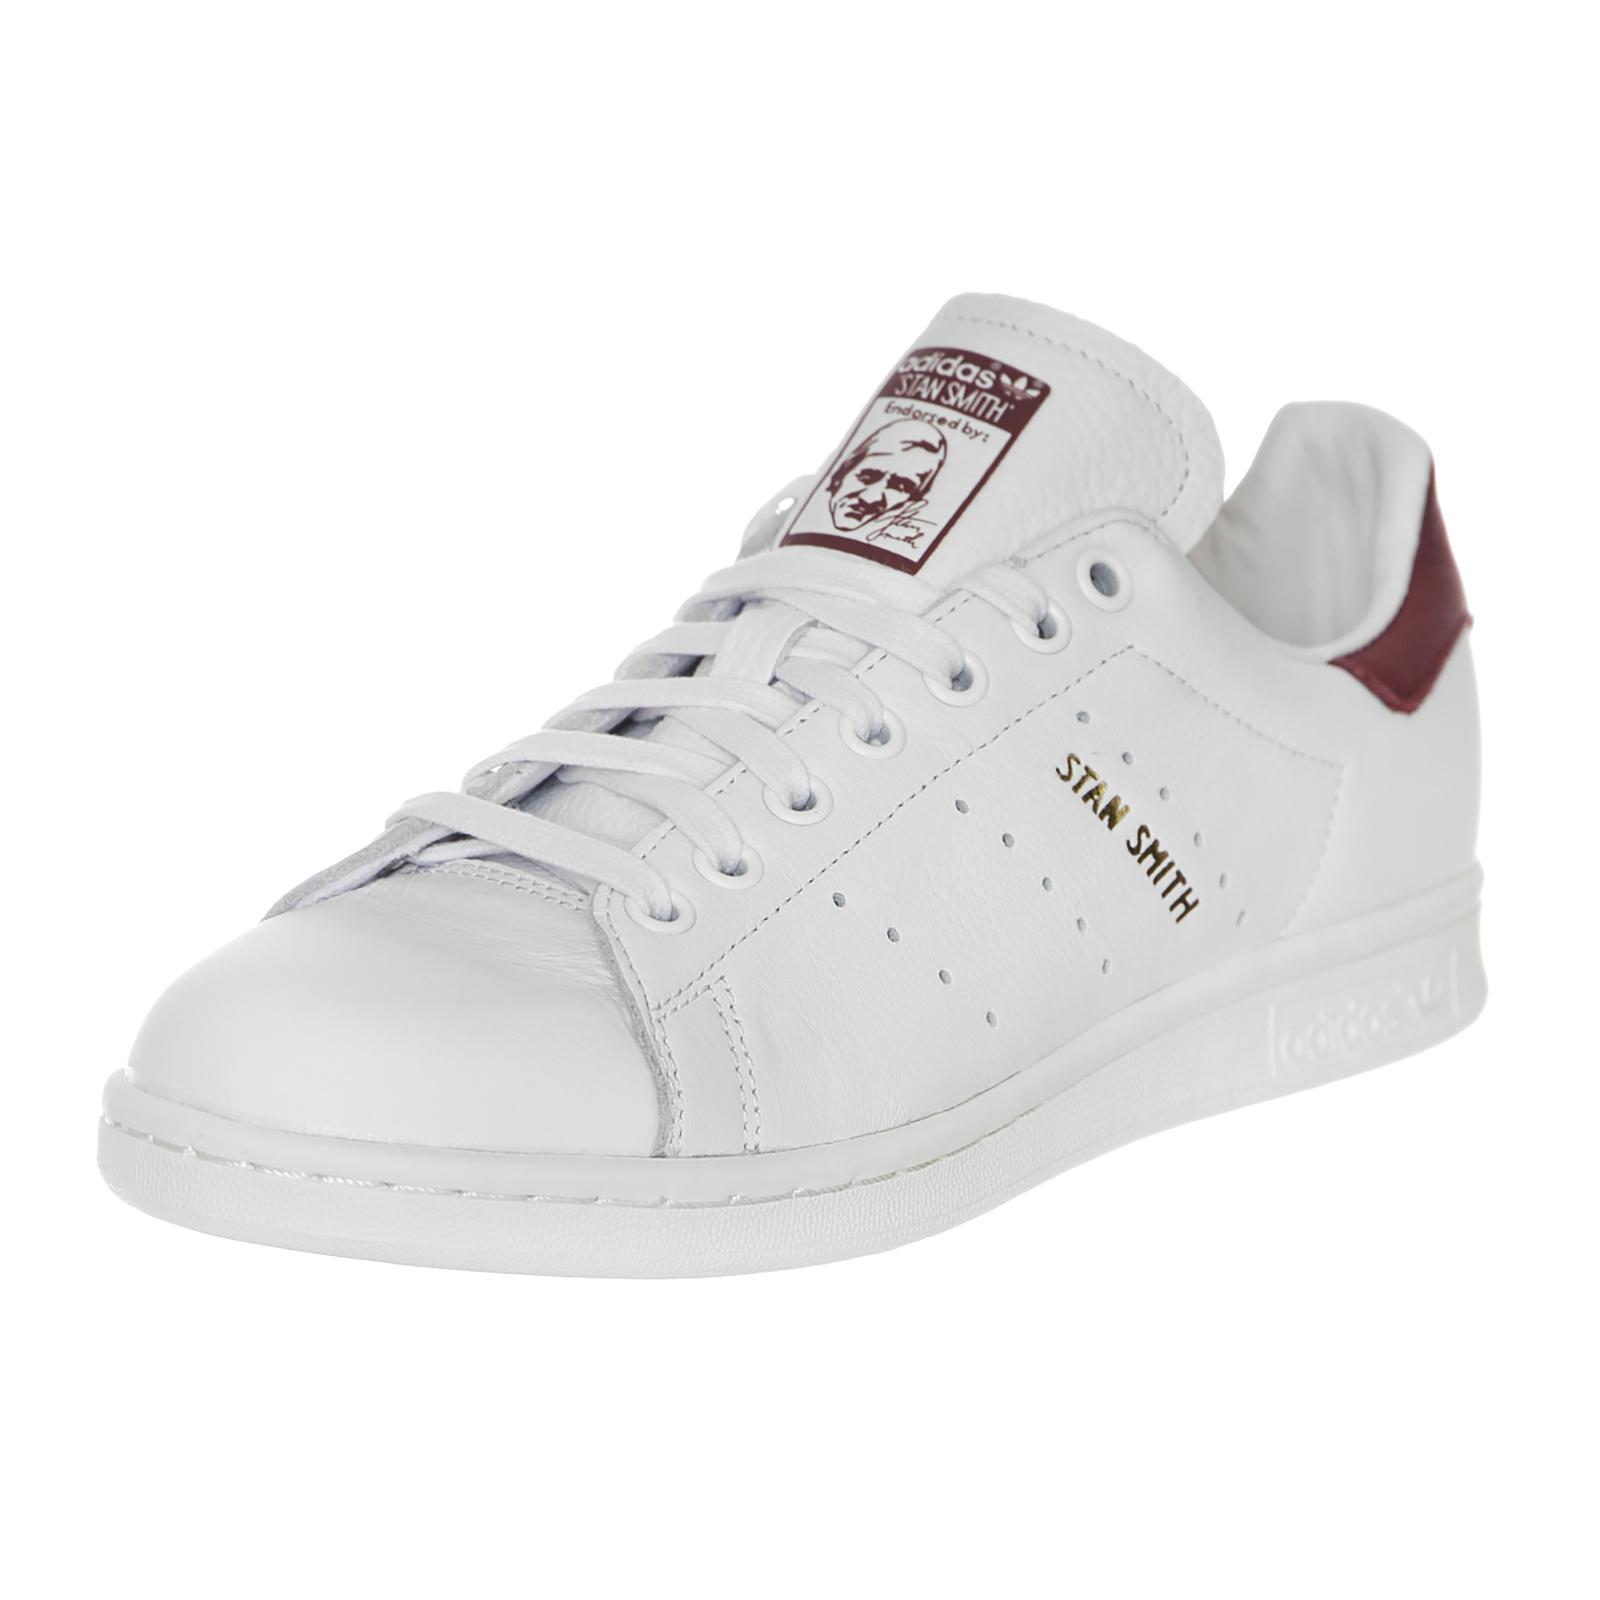 Adidas Stan Smith Ftwwht/Ftwwht/Cburgu Bianco Bianco Ftwwht/Ftwwht/Cburgu Bianco 6936c0